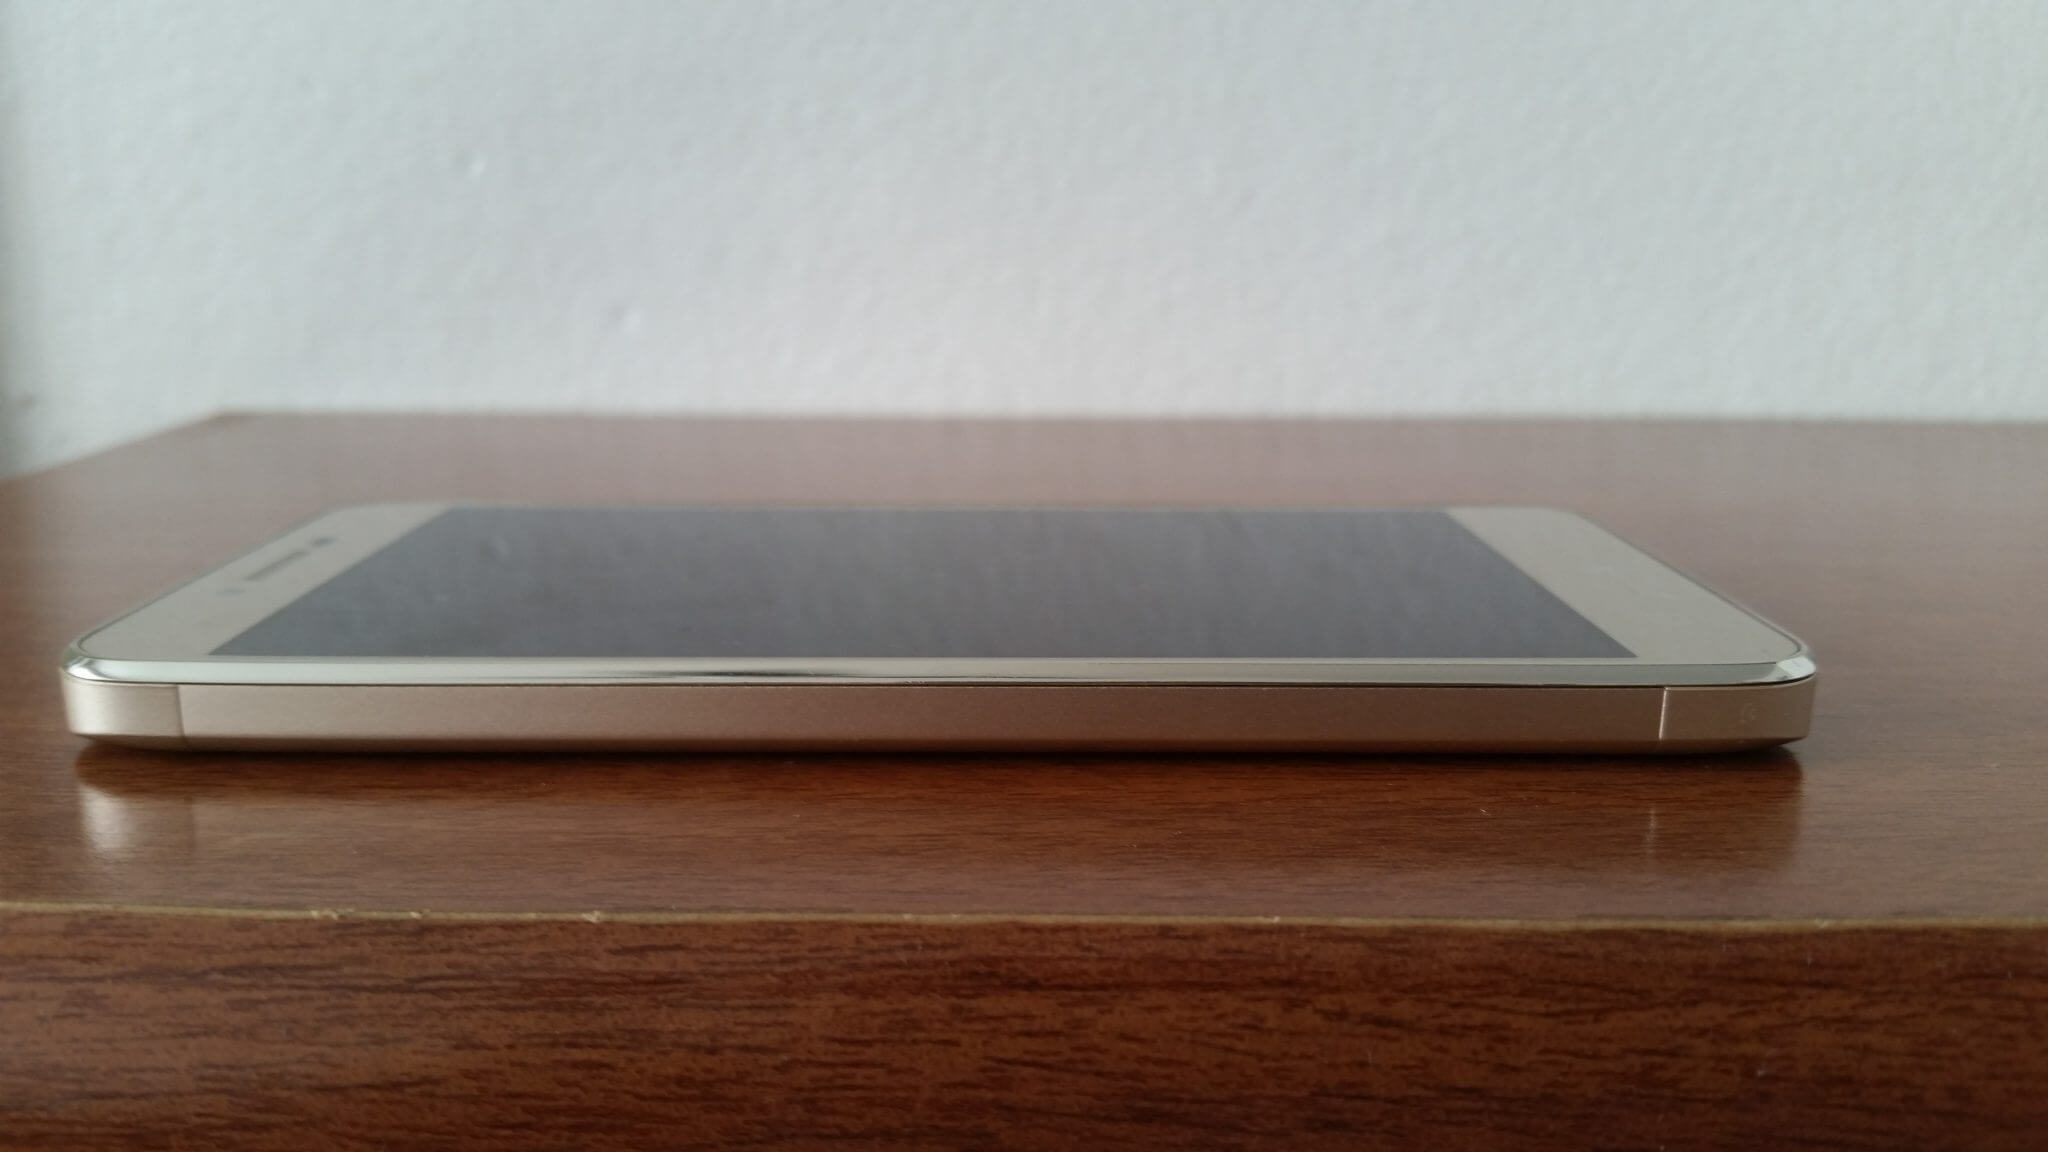 Lenovo Vibe K5-Desempenho